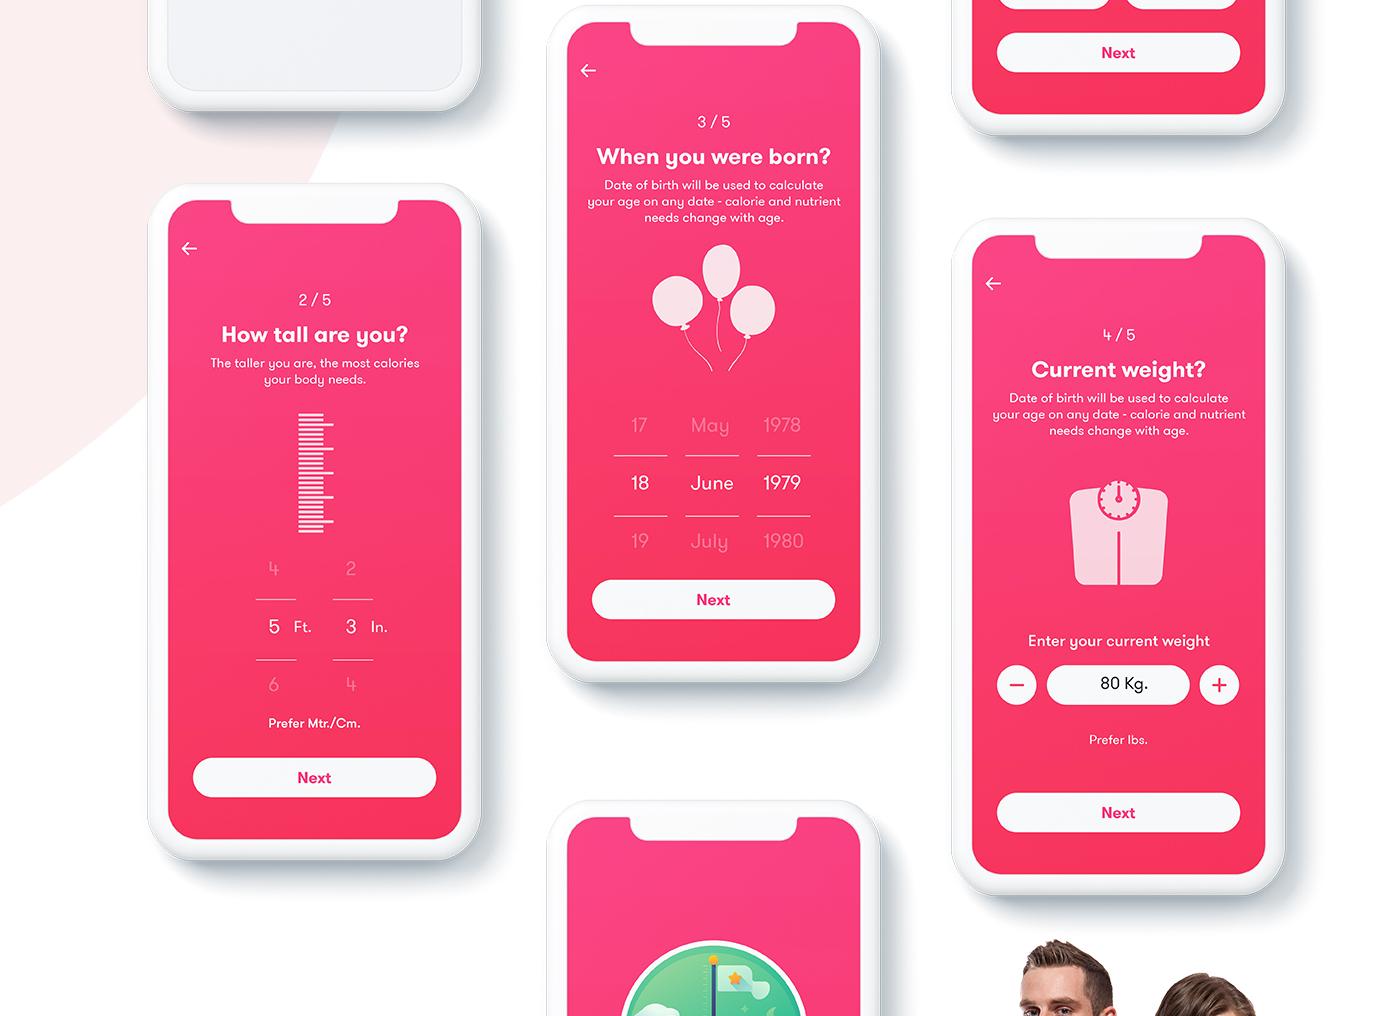 fitness app,Calorie Counter App,Mobile APP UI,App UI/UX,Latest APP UI,yoga app,exercise app,Health,UI/UX